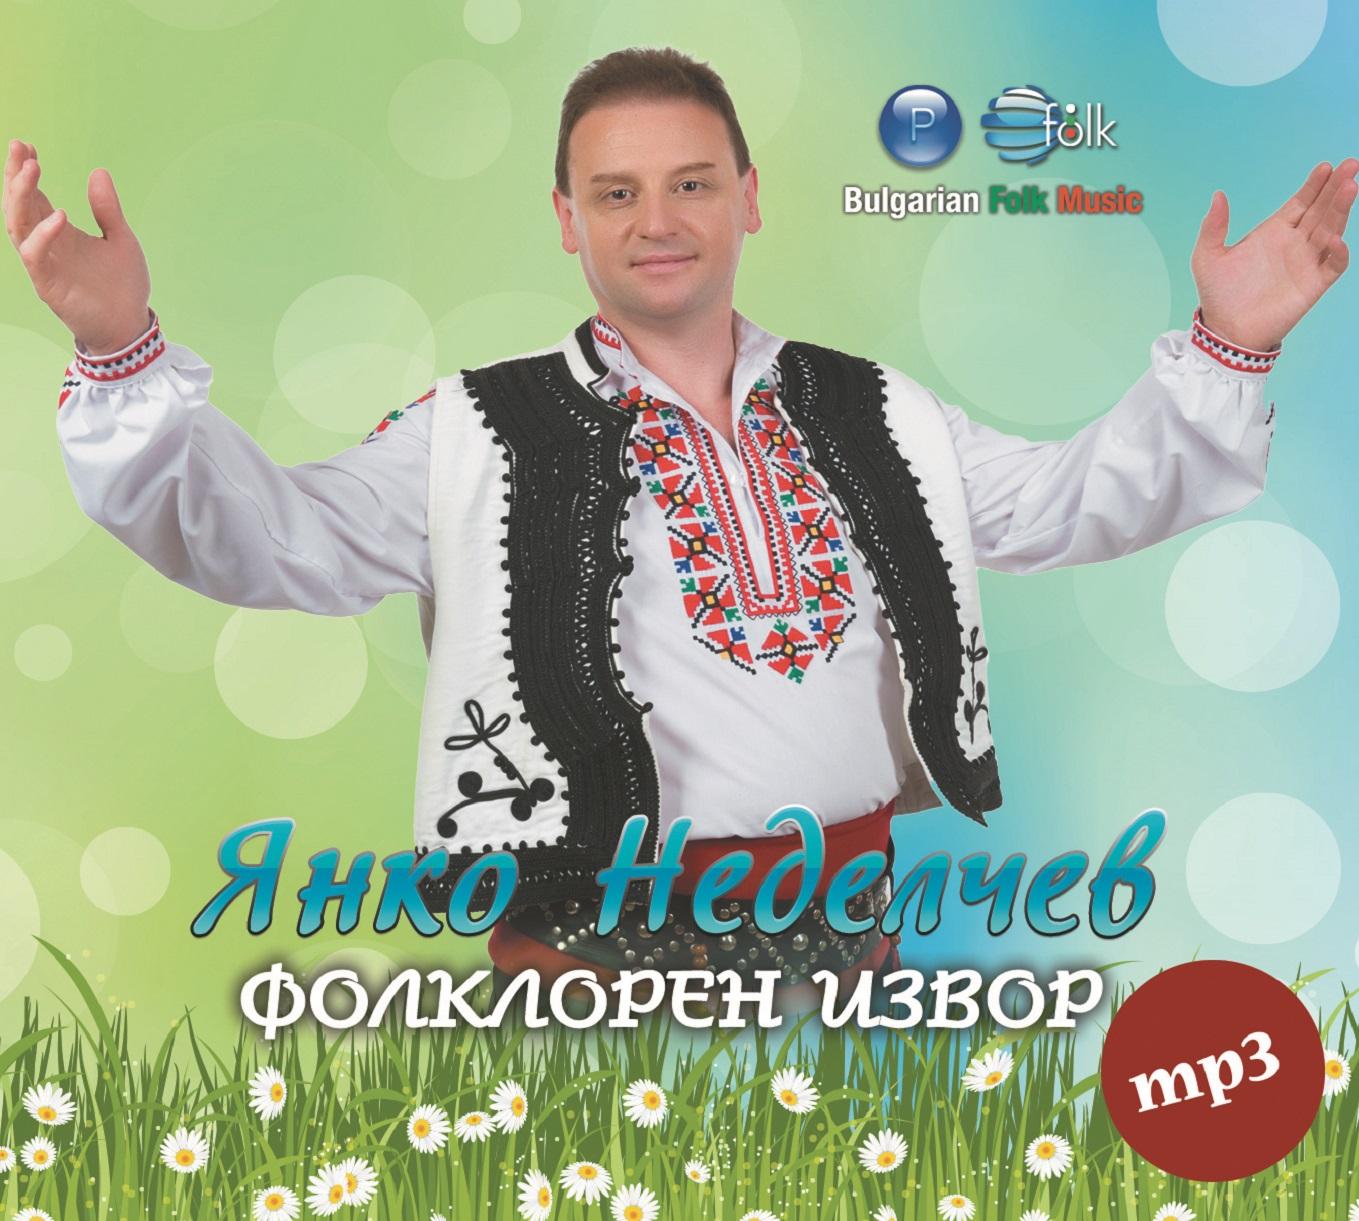 Янко Неделчев с юбилеен MP3 албум